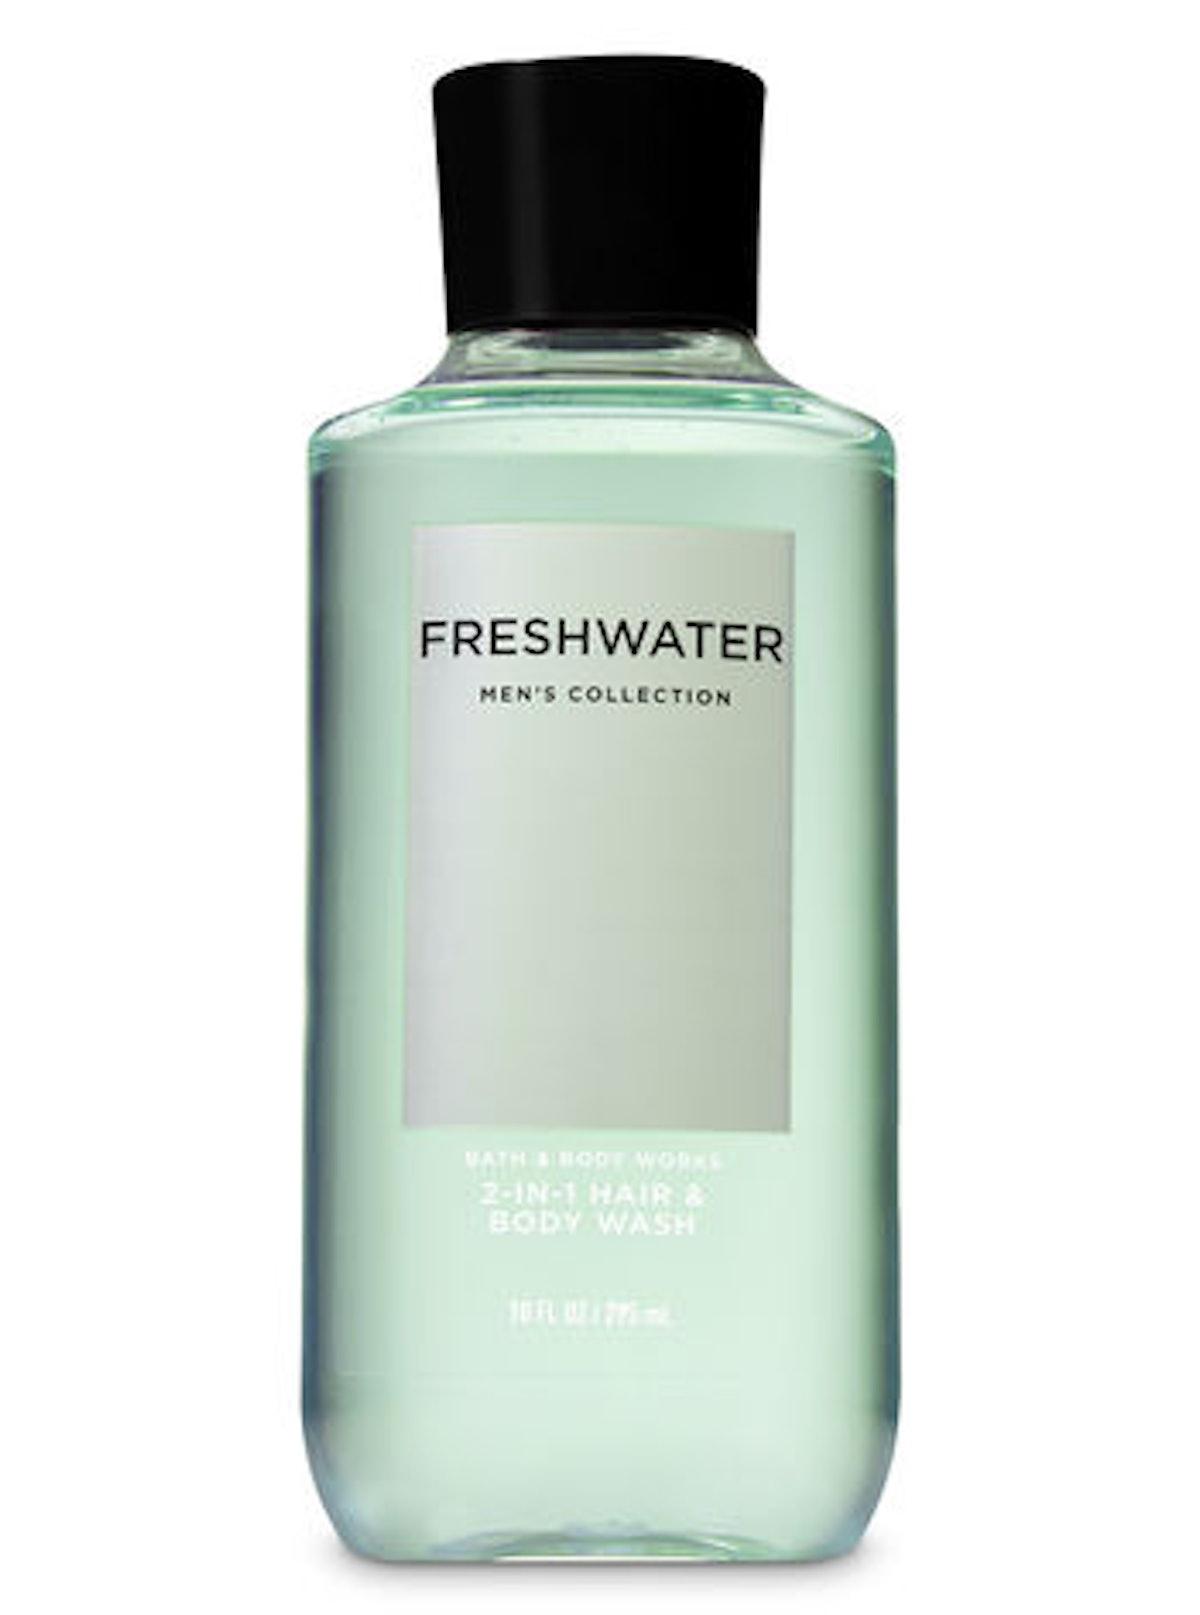 Freshwater 2-in-1 Hair & Body Wash